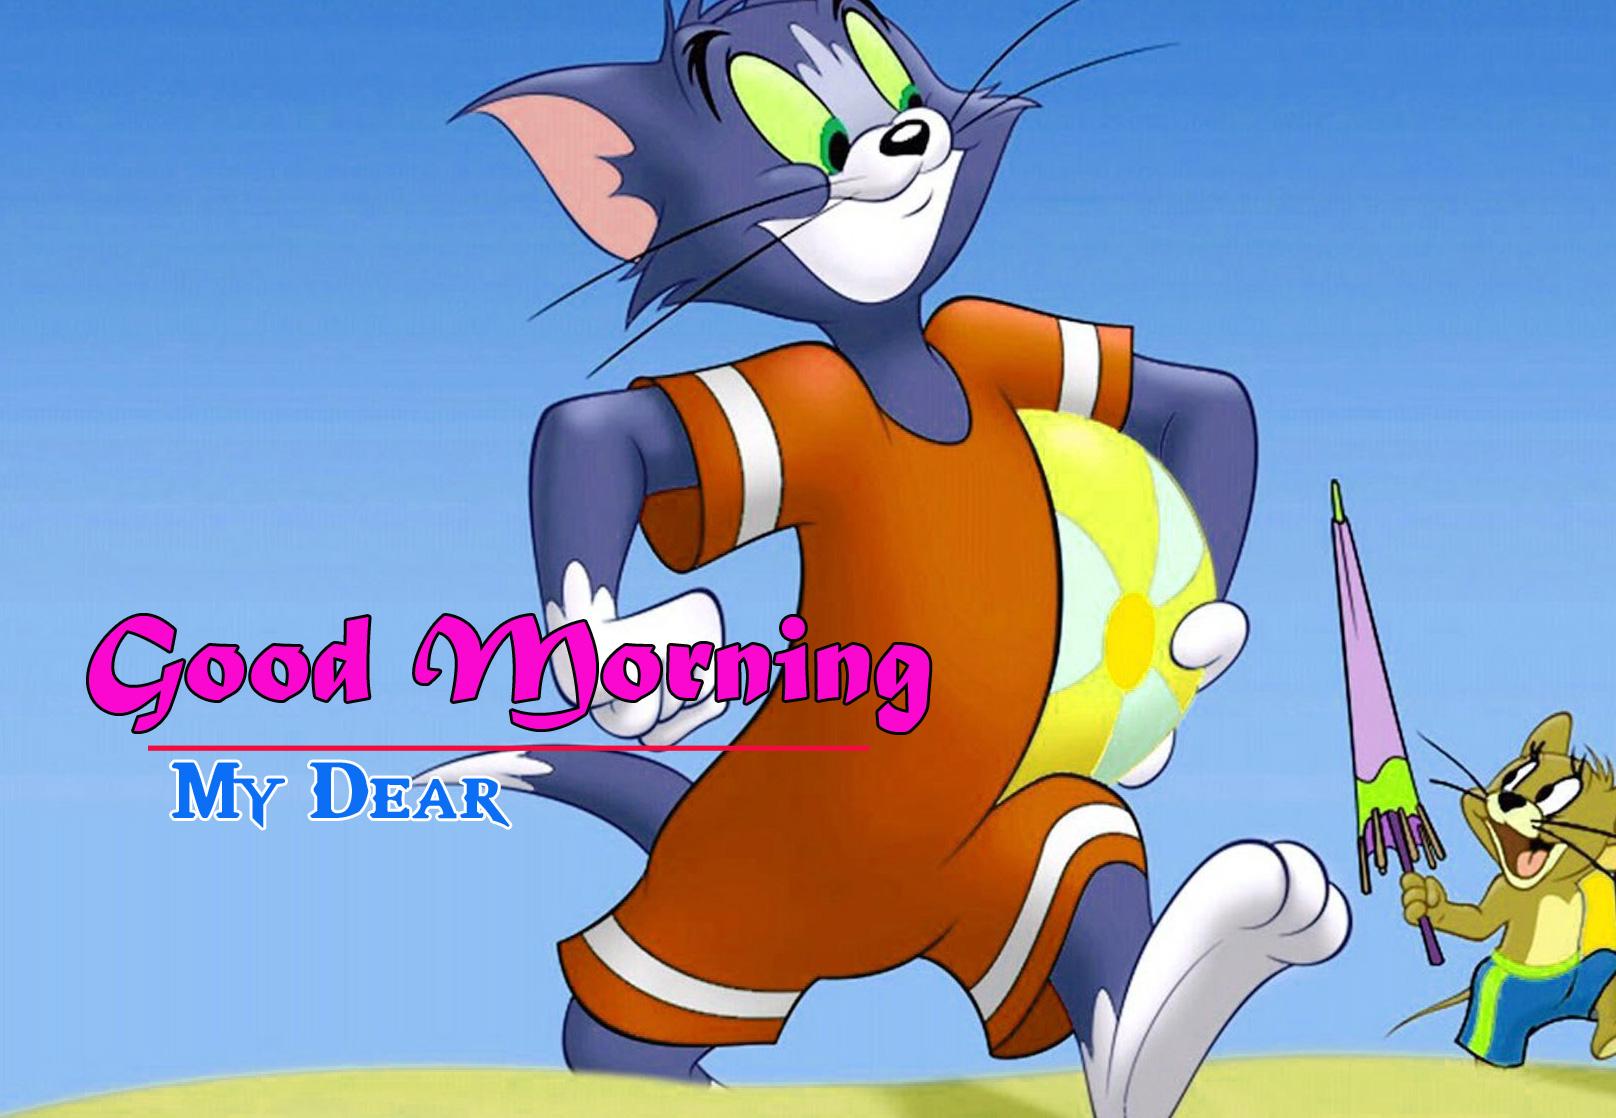 Cartoon Good Morning Images Pics for Whatsapp